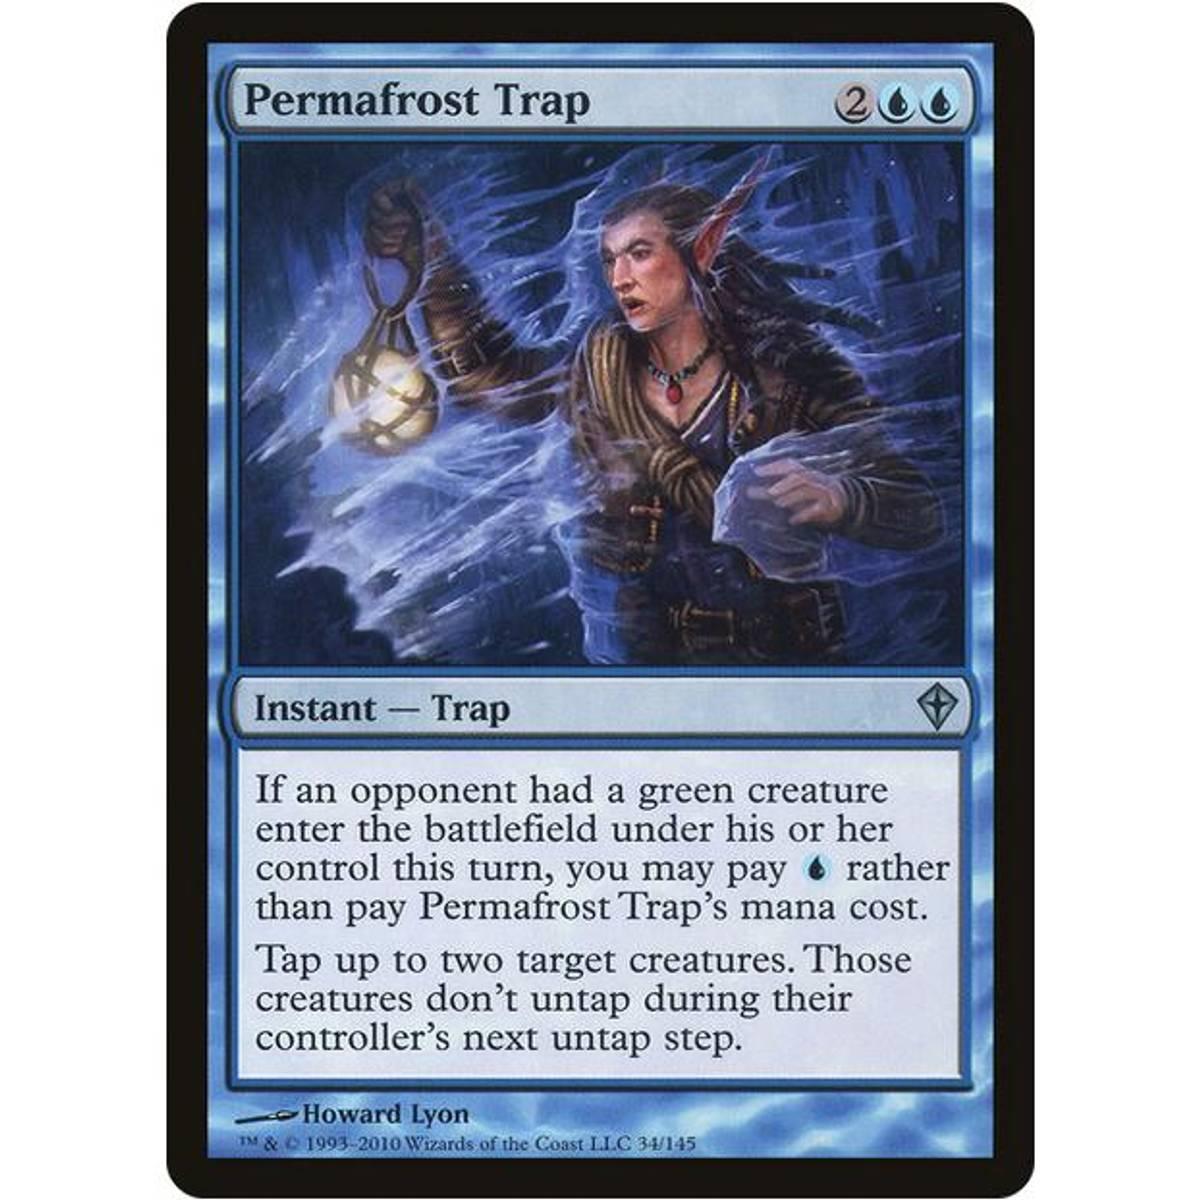 Permafrost Trap